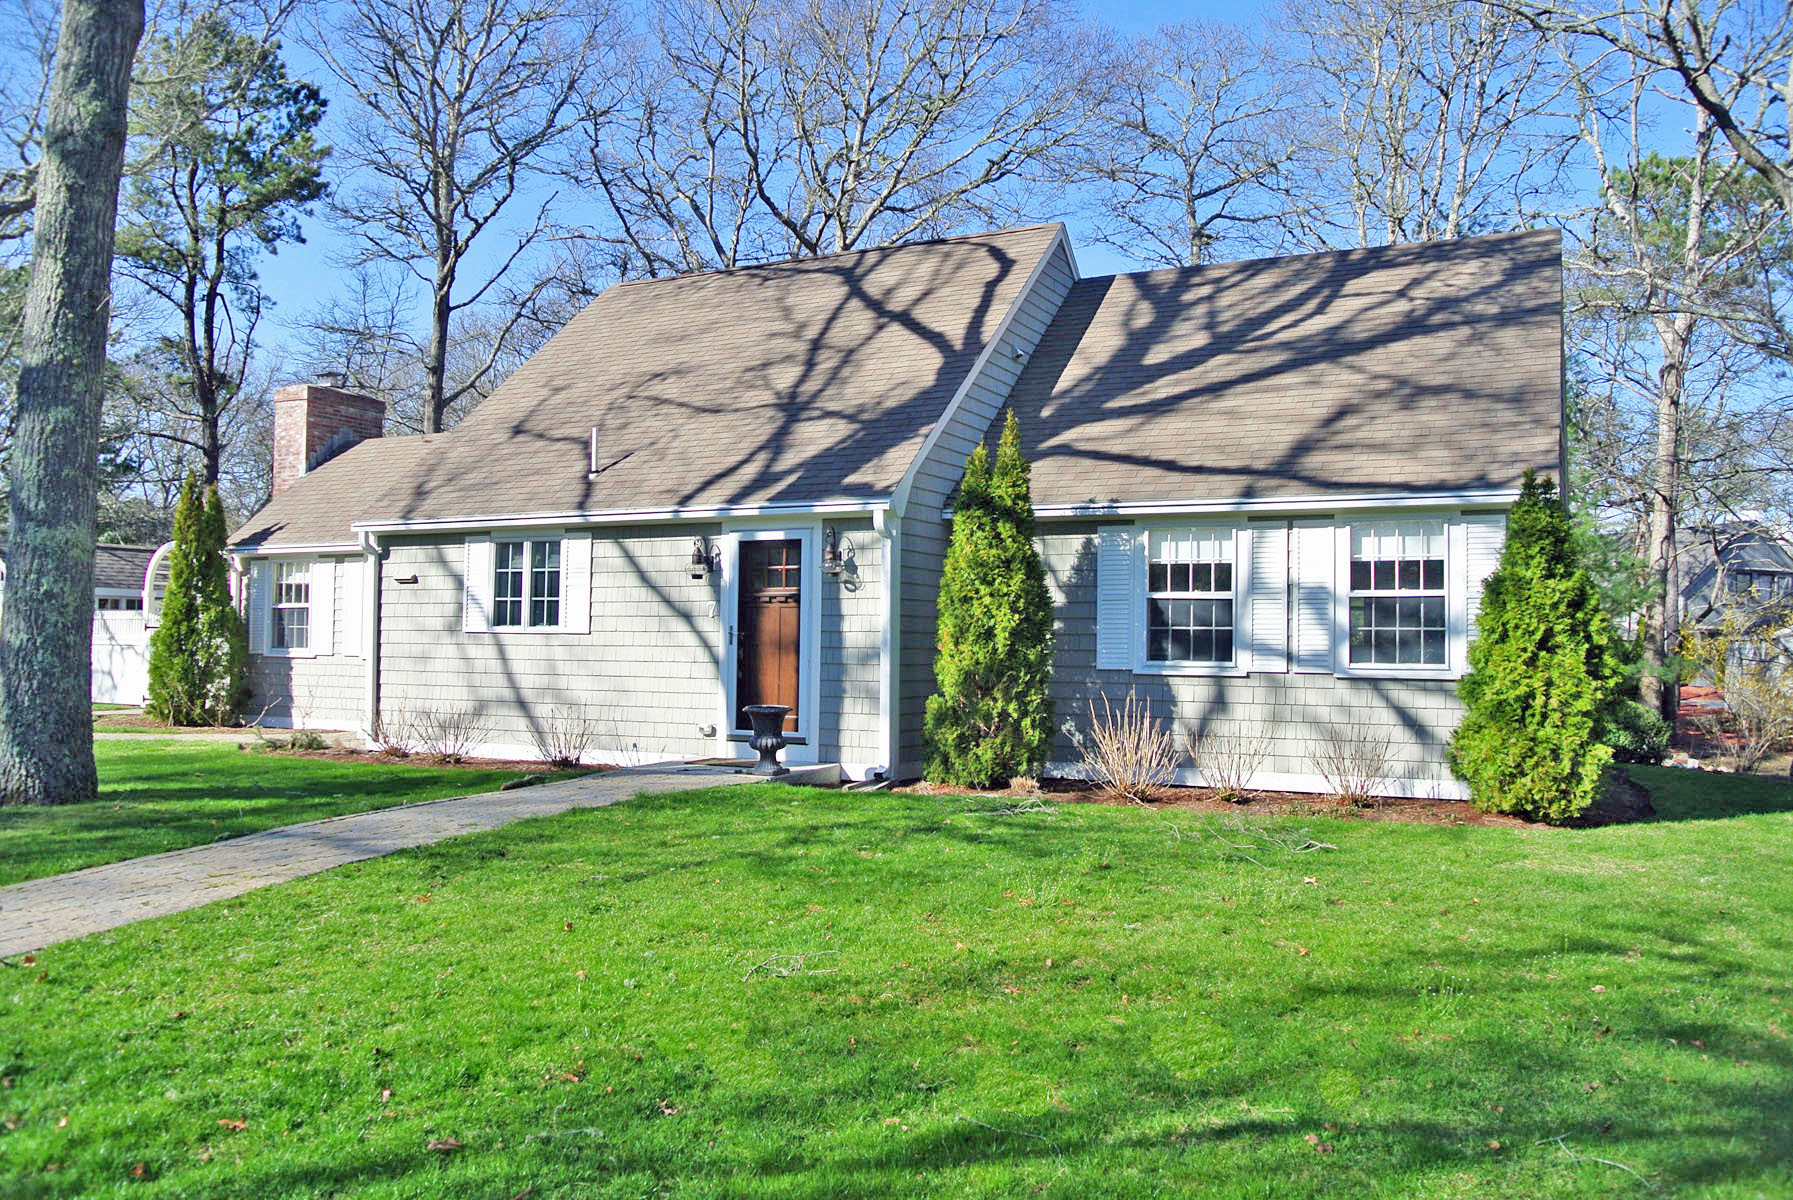 Single Family Home for Sale at EXQUISITE HOME 7 Sand Dollar Lane New Seabury, Massachusetts, 02649 United StatesIn/Around: Mashpee